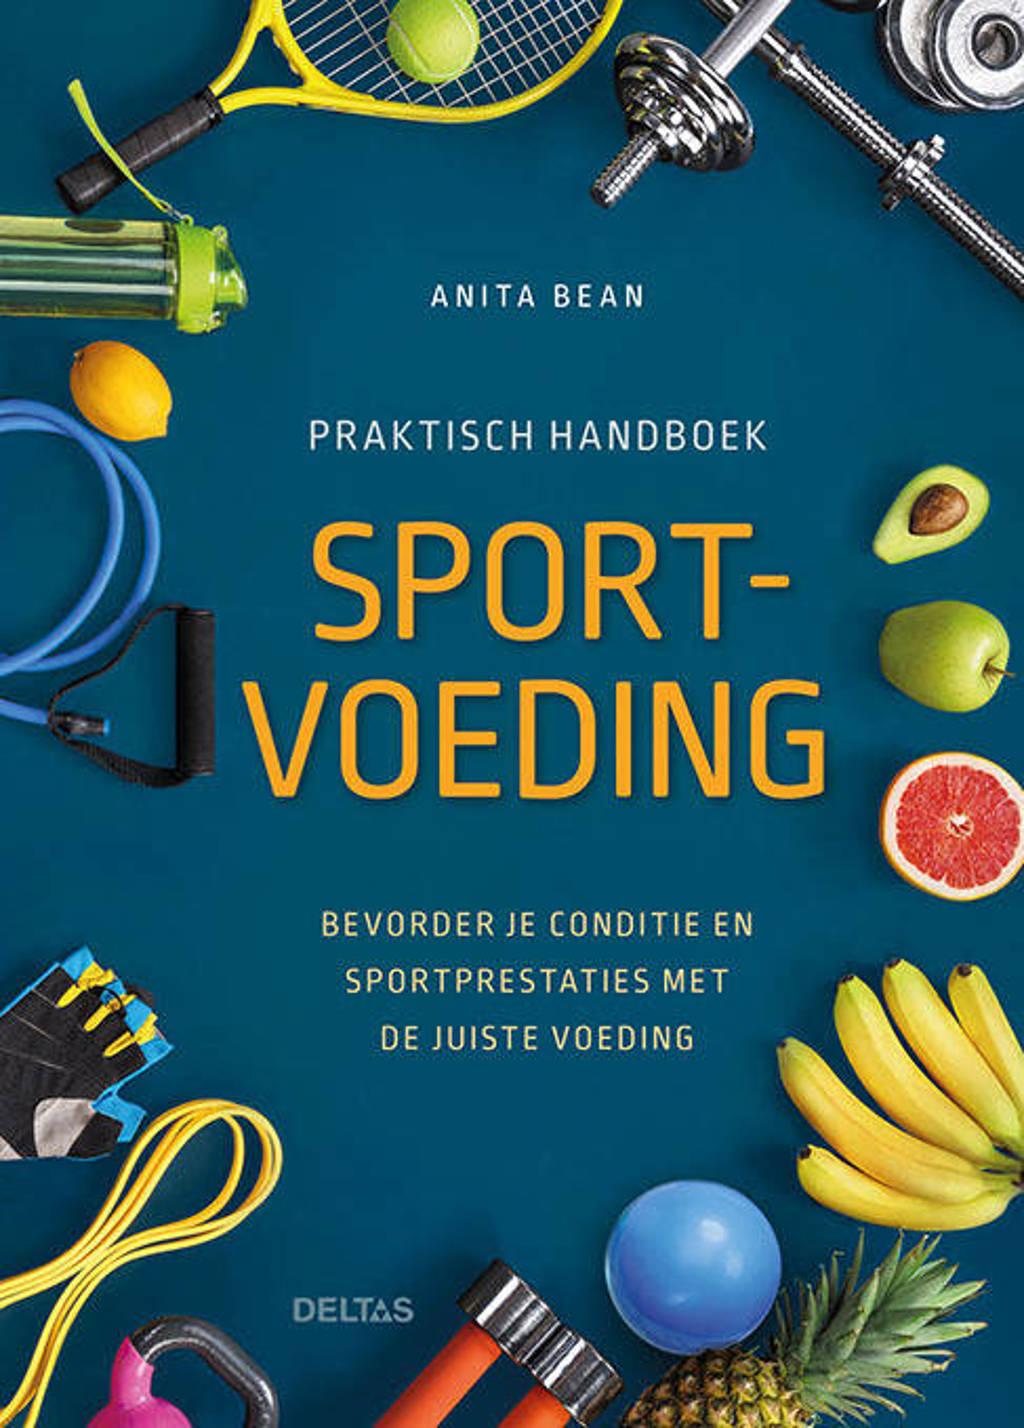 Praktisch handboek sportvoeding - Anita Bean